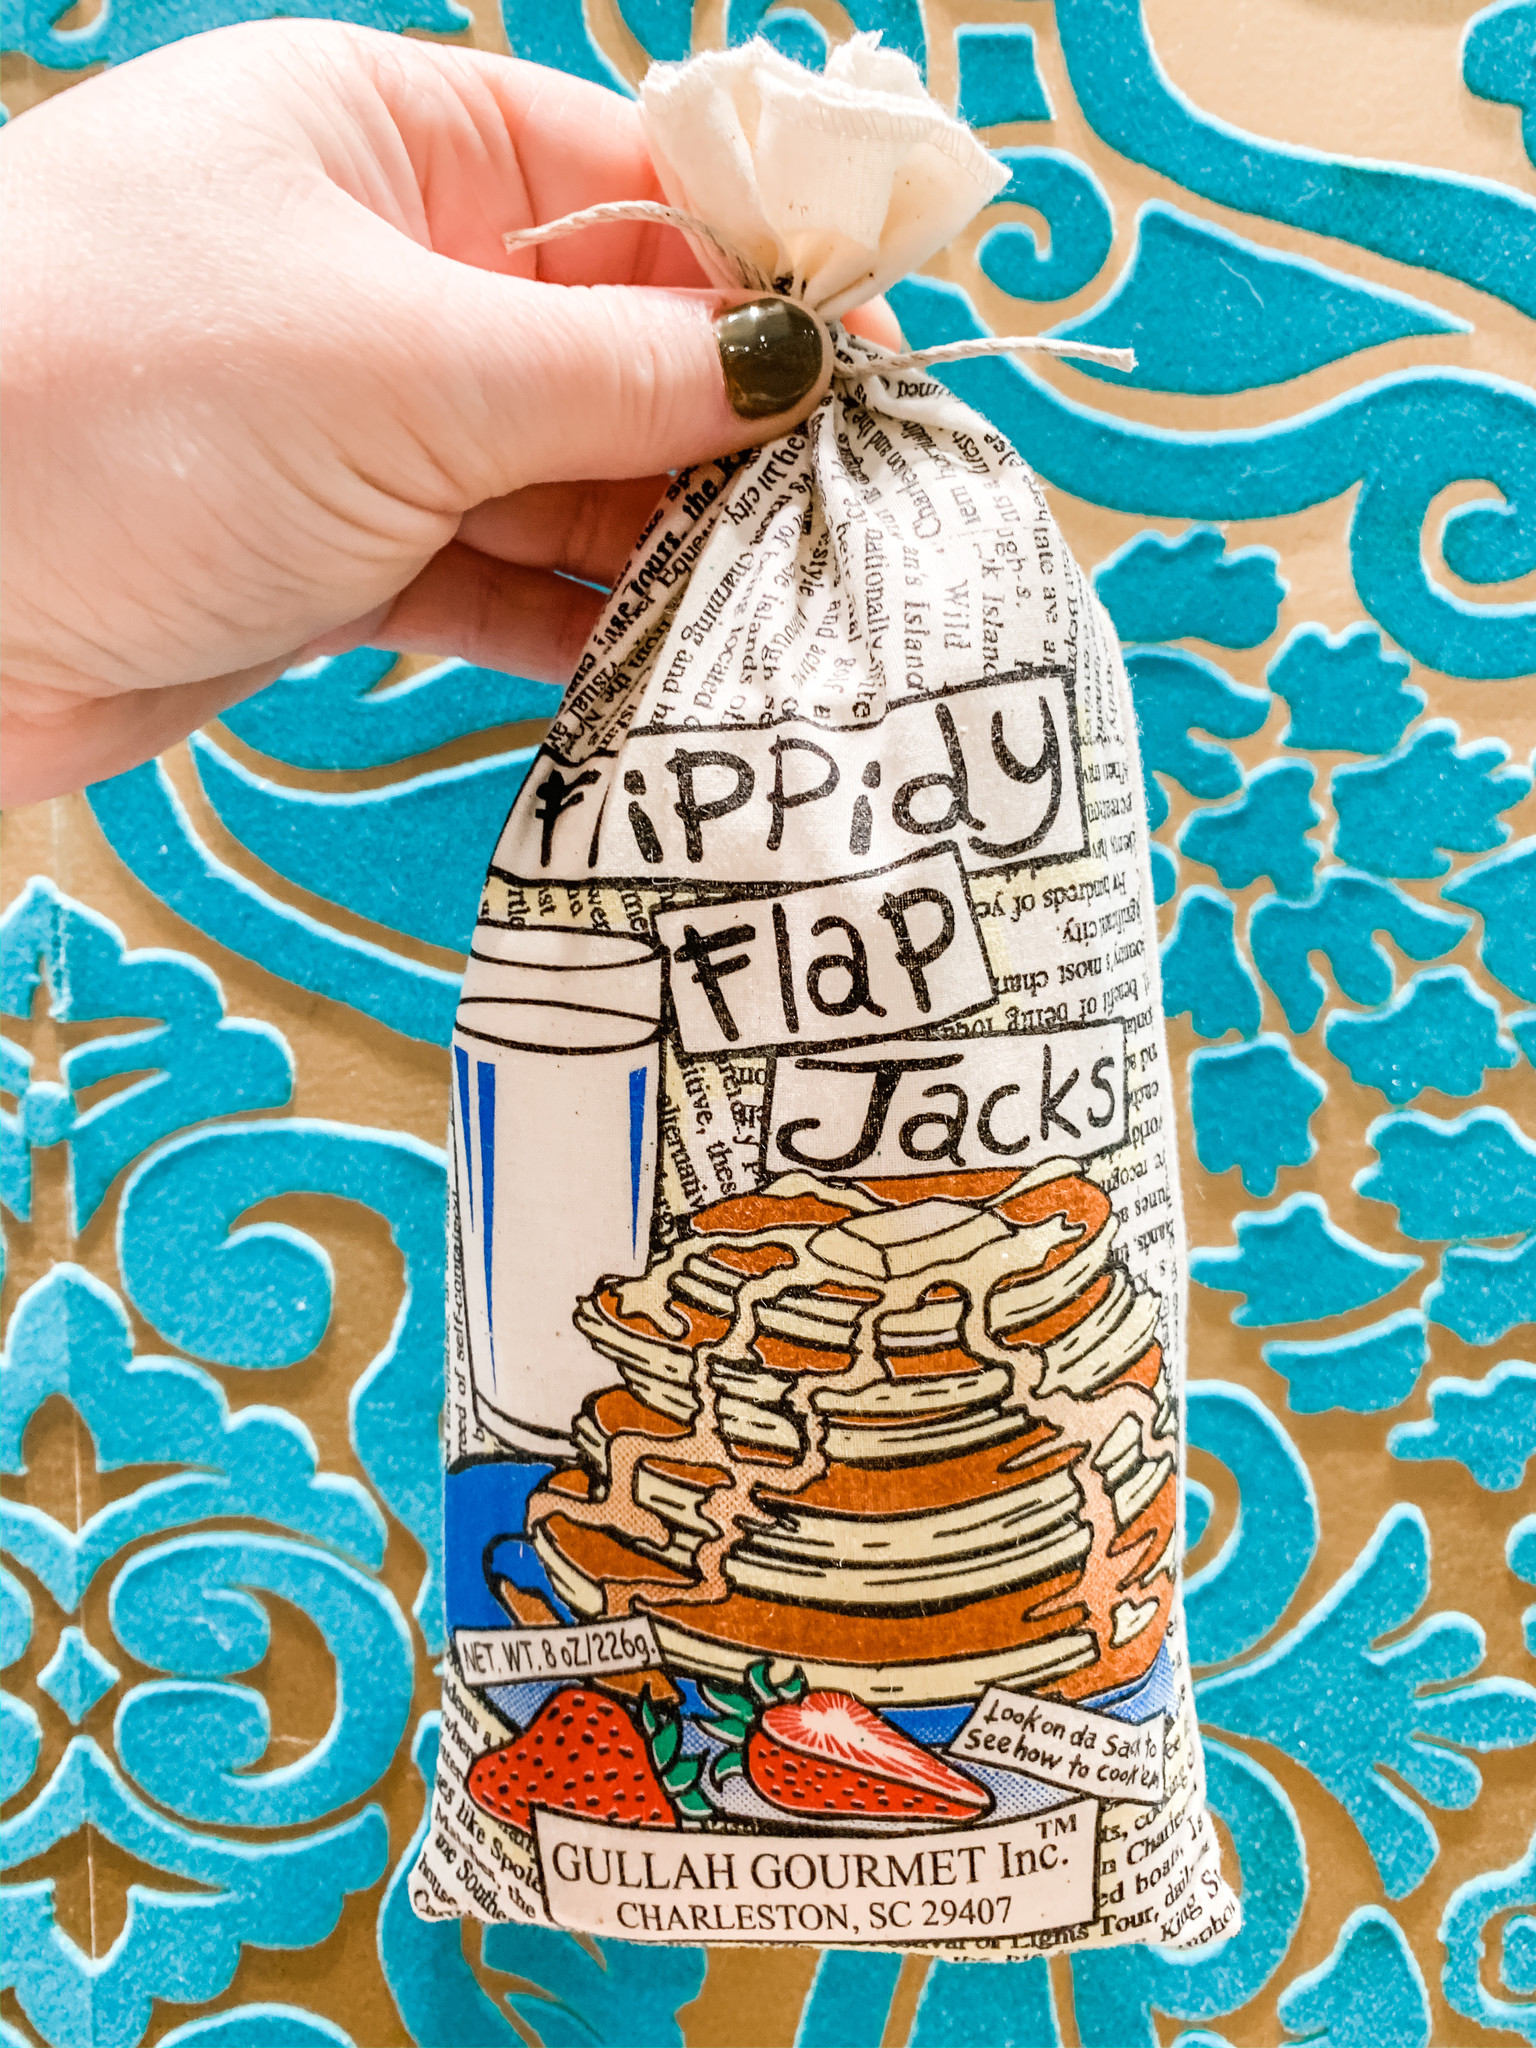 Gullah Gourmet Flippity Flap Jacks